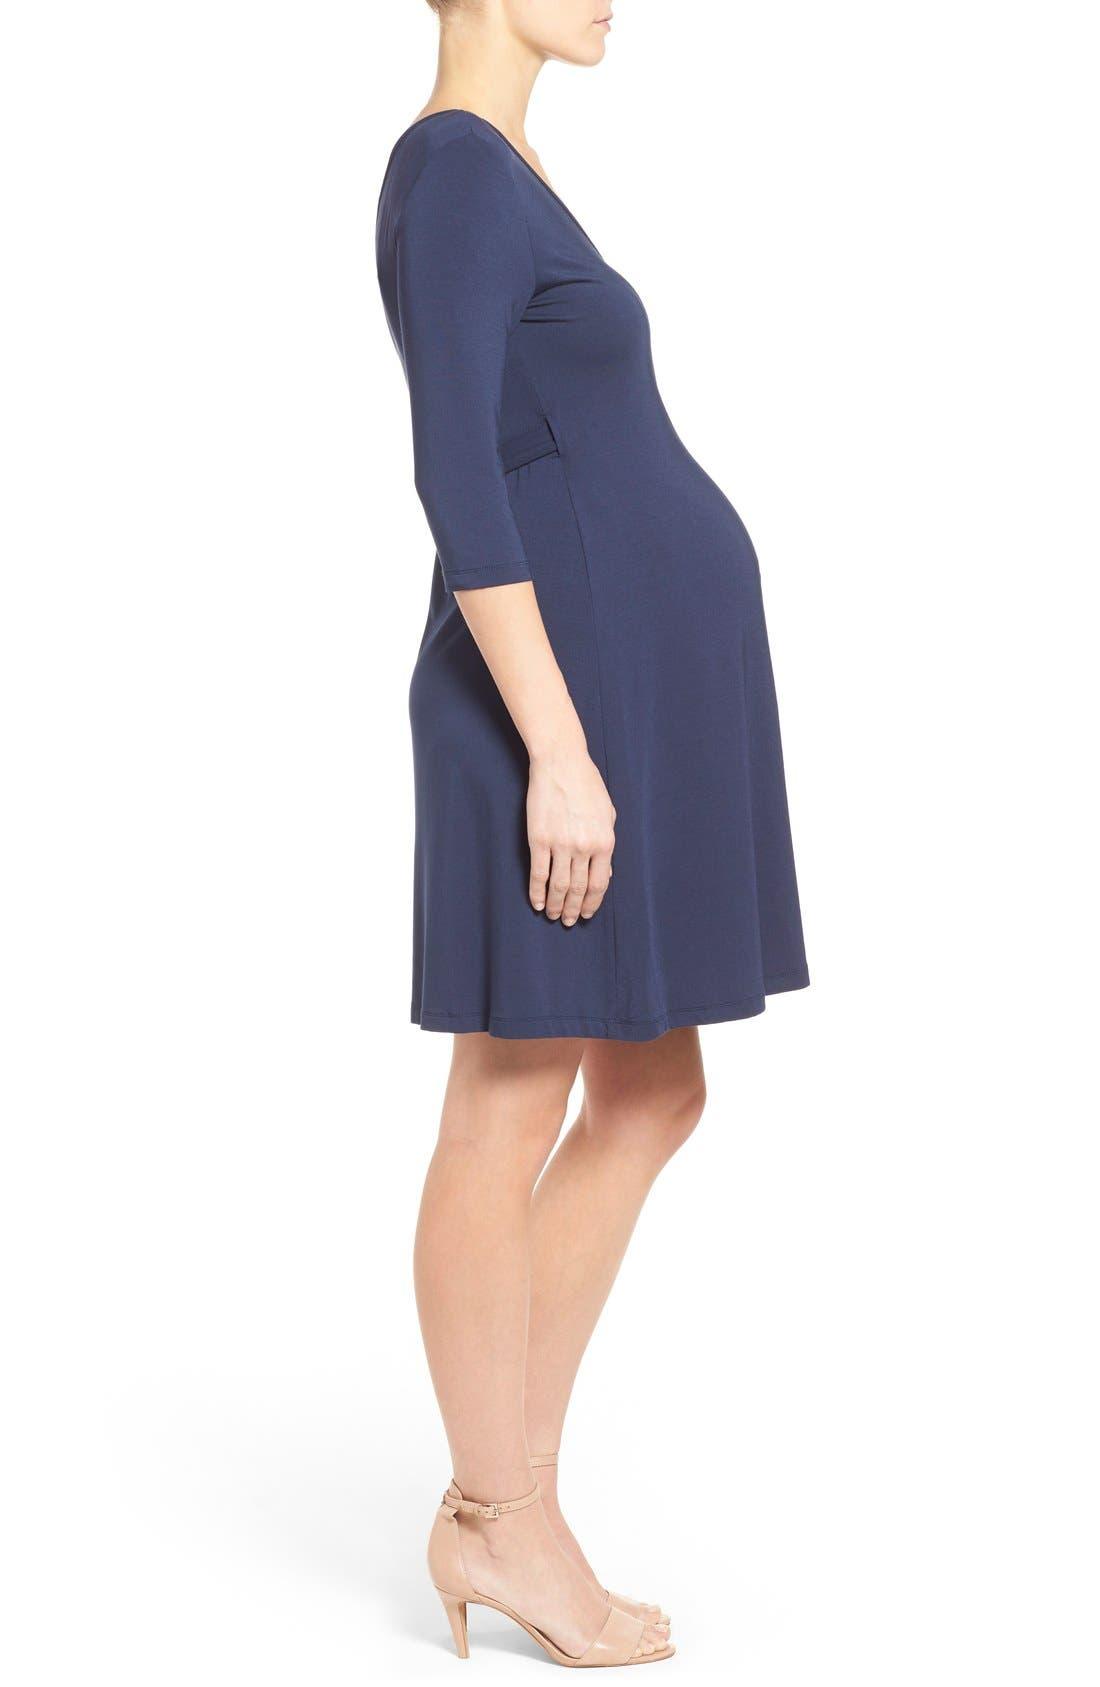 'Rhiannon' Turtleneck Fit & Flare Maternity Dress,                             Alternate thumbnail 3, color,                             Peacoat